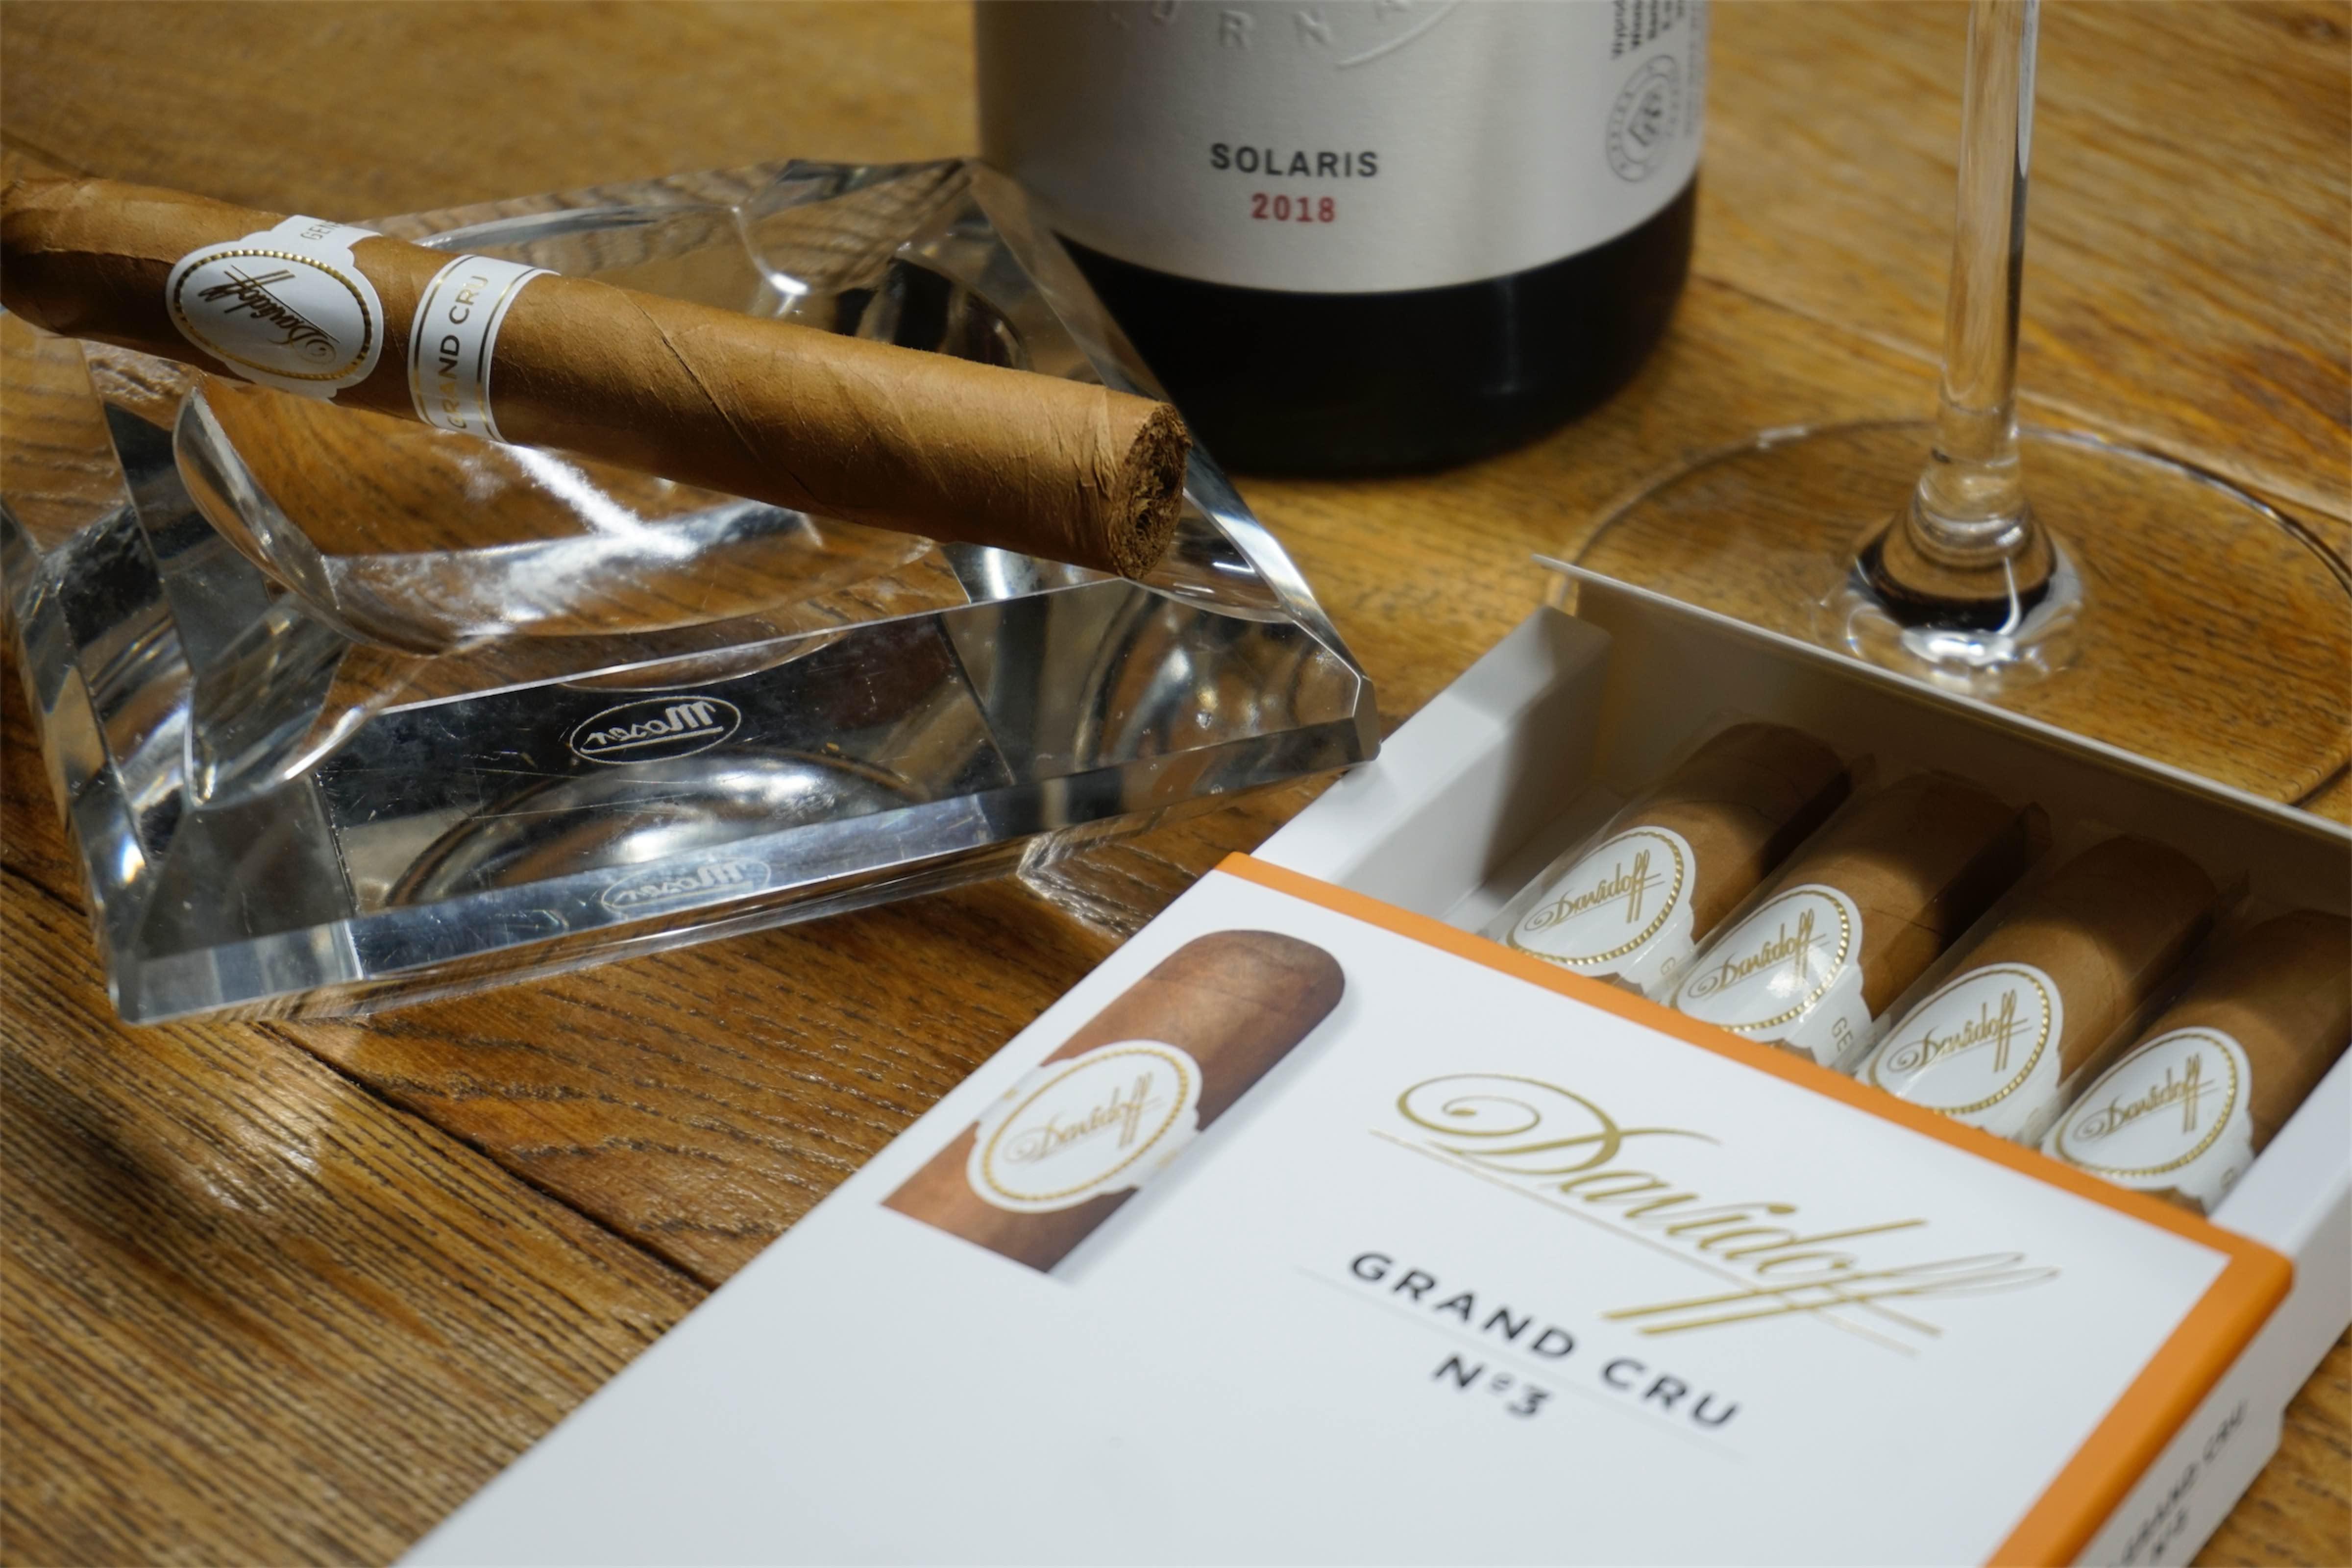 Solaris, winnica Turnau - znakomita para dla cygara Davidoff Grand Cru. Manufaktura Marzeń